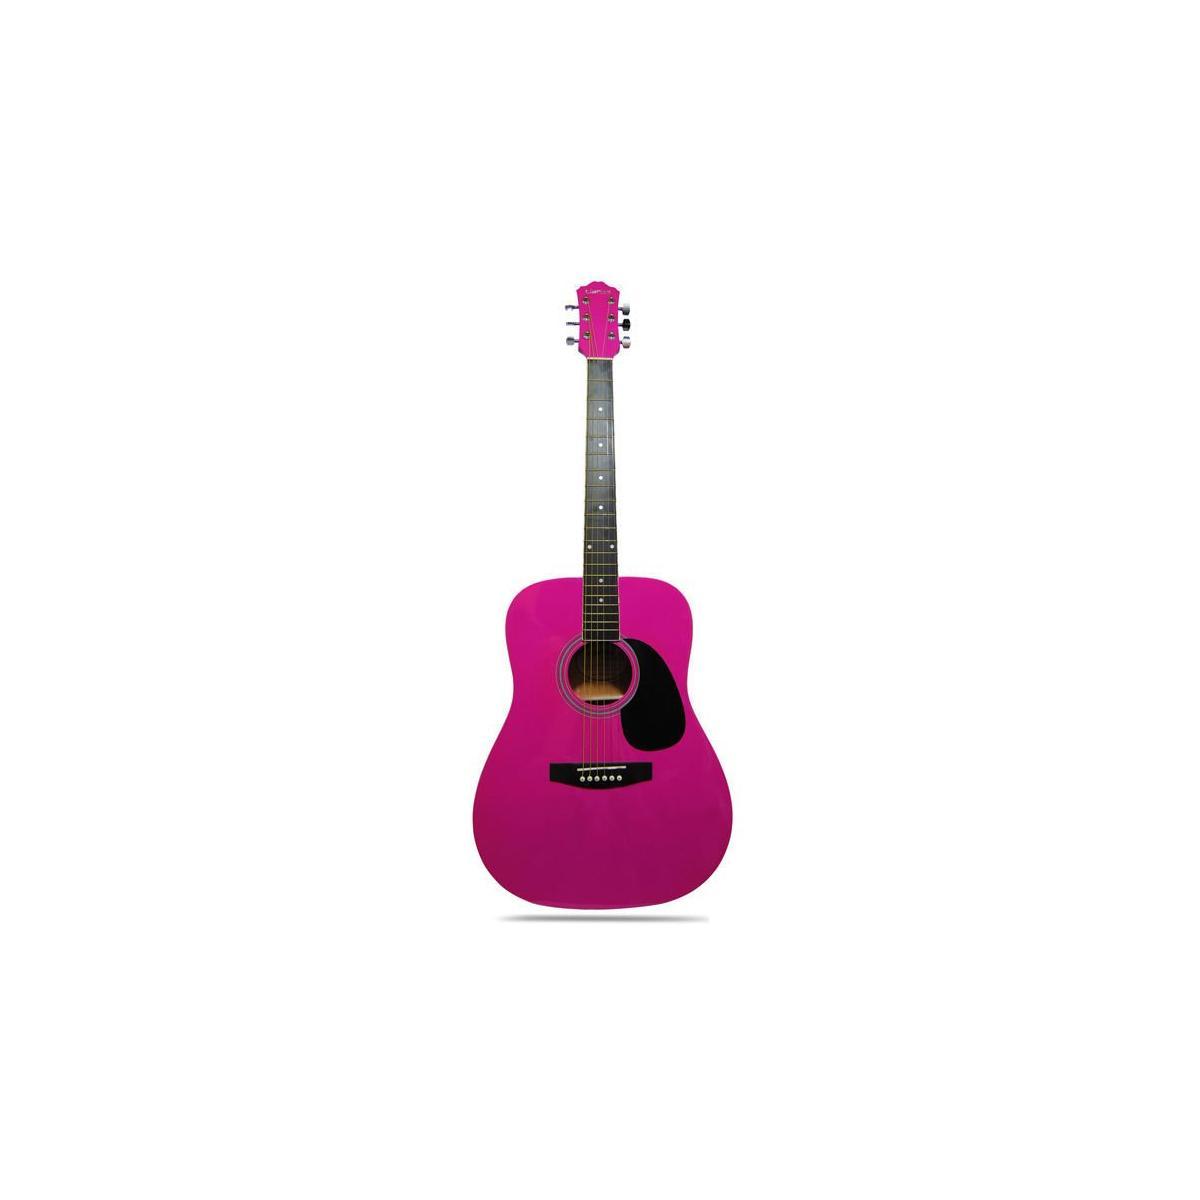 clariss akustik gitarlar